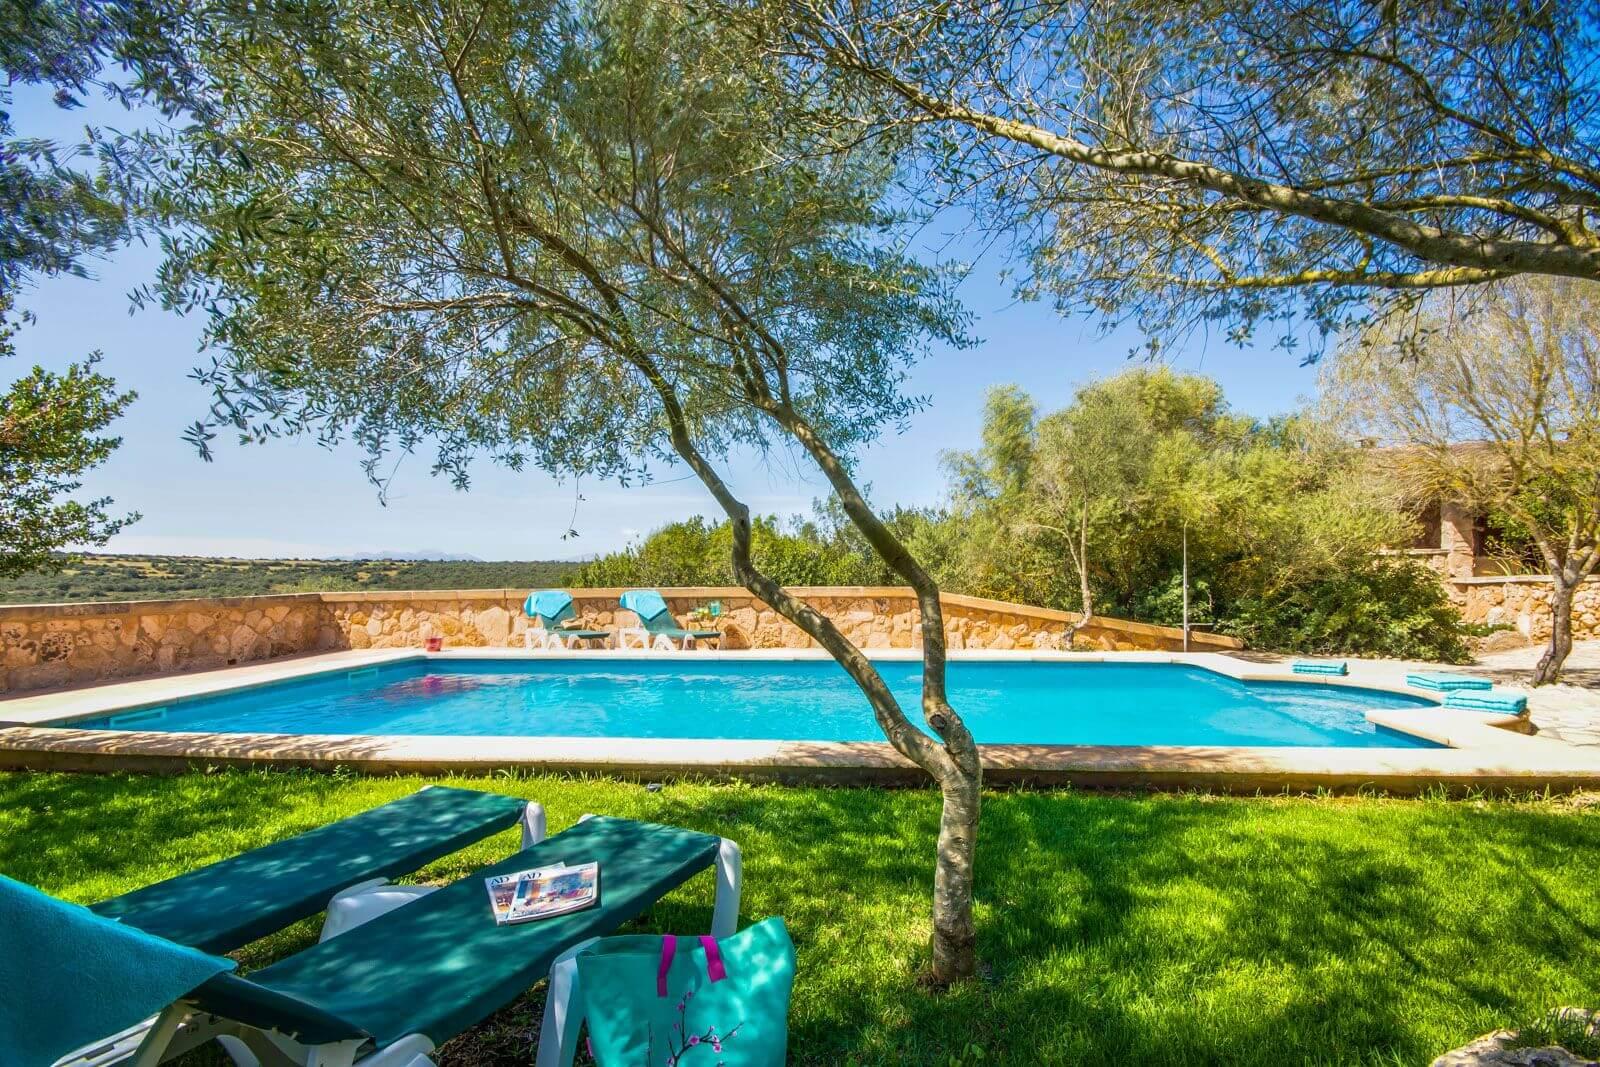 Finca Mallorca Melito - Blick auf Pool und Liegeflächen